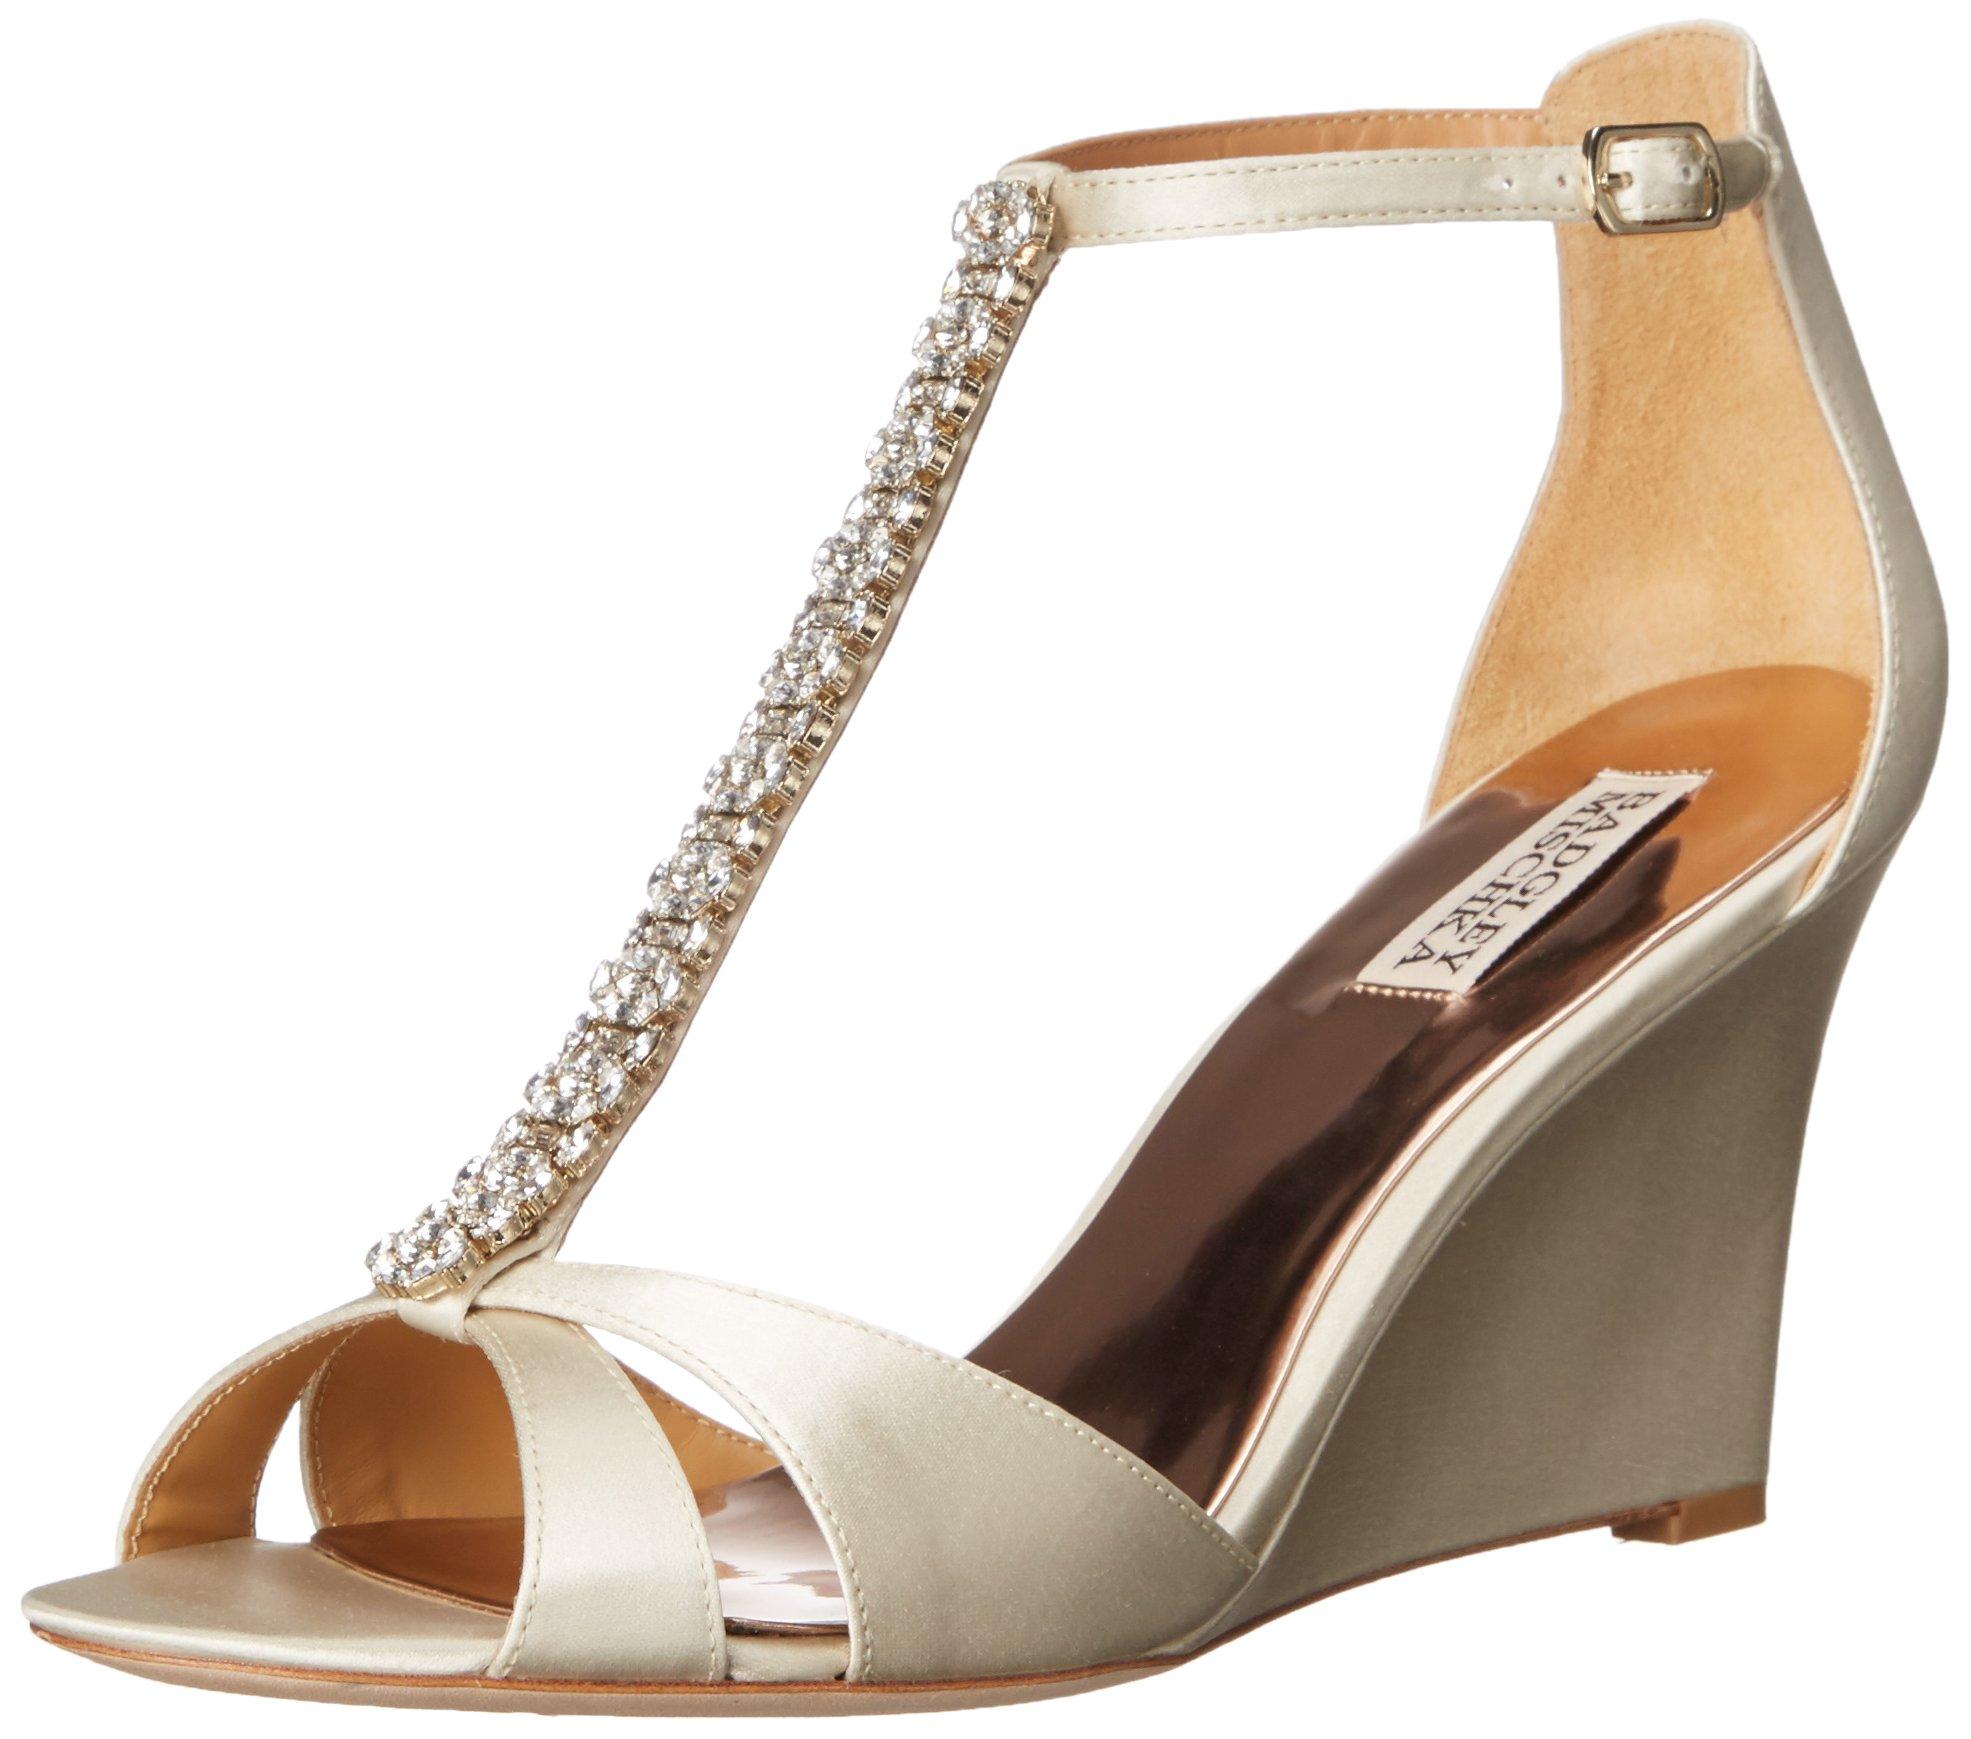 Badgley Mischka Women's Romance Wedge Sandal, Ivory, 7.5 M US